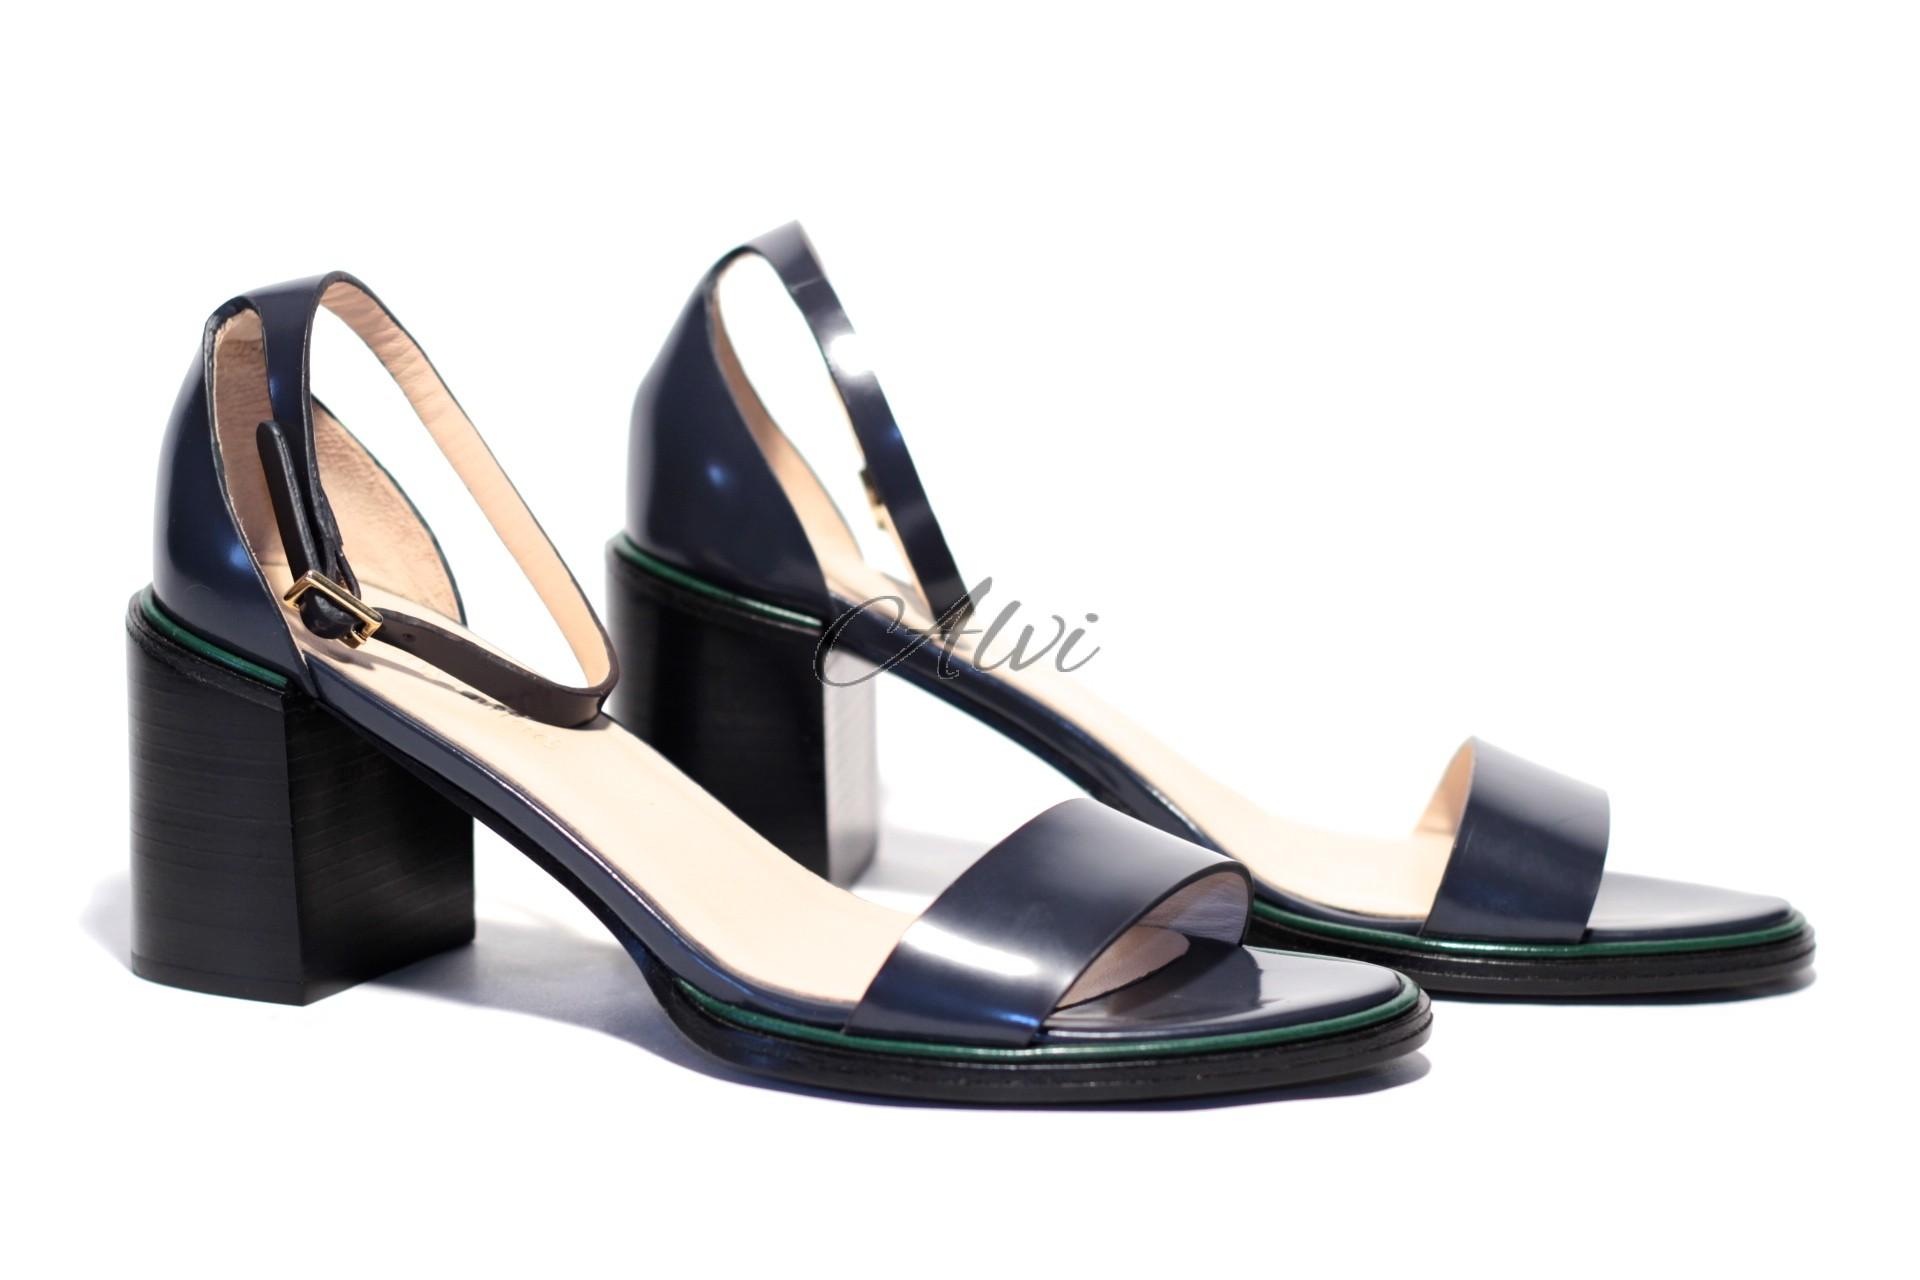 Sandalo See Dxowqecrbe Vzuqmsp Tacco By Blu Chloé Medio qS4ARjL3c5